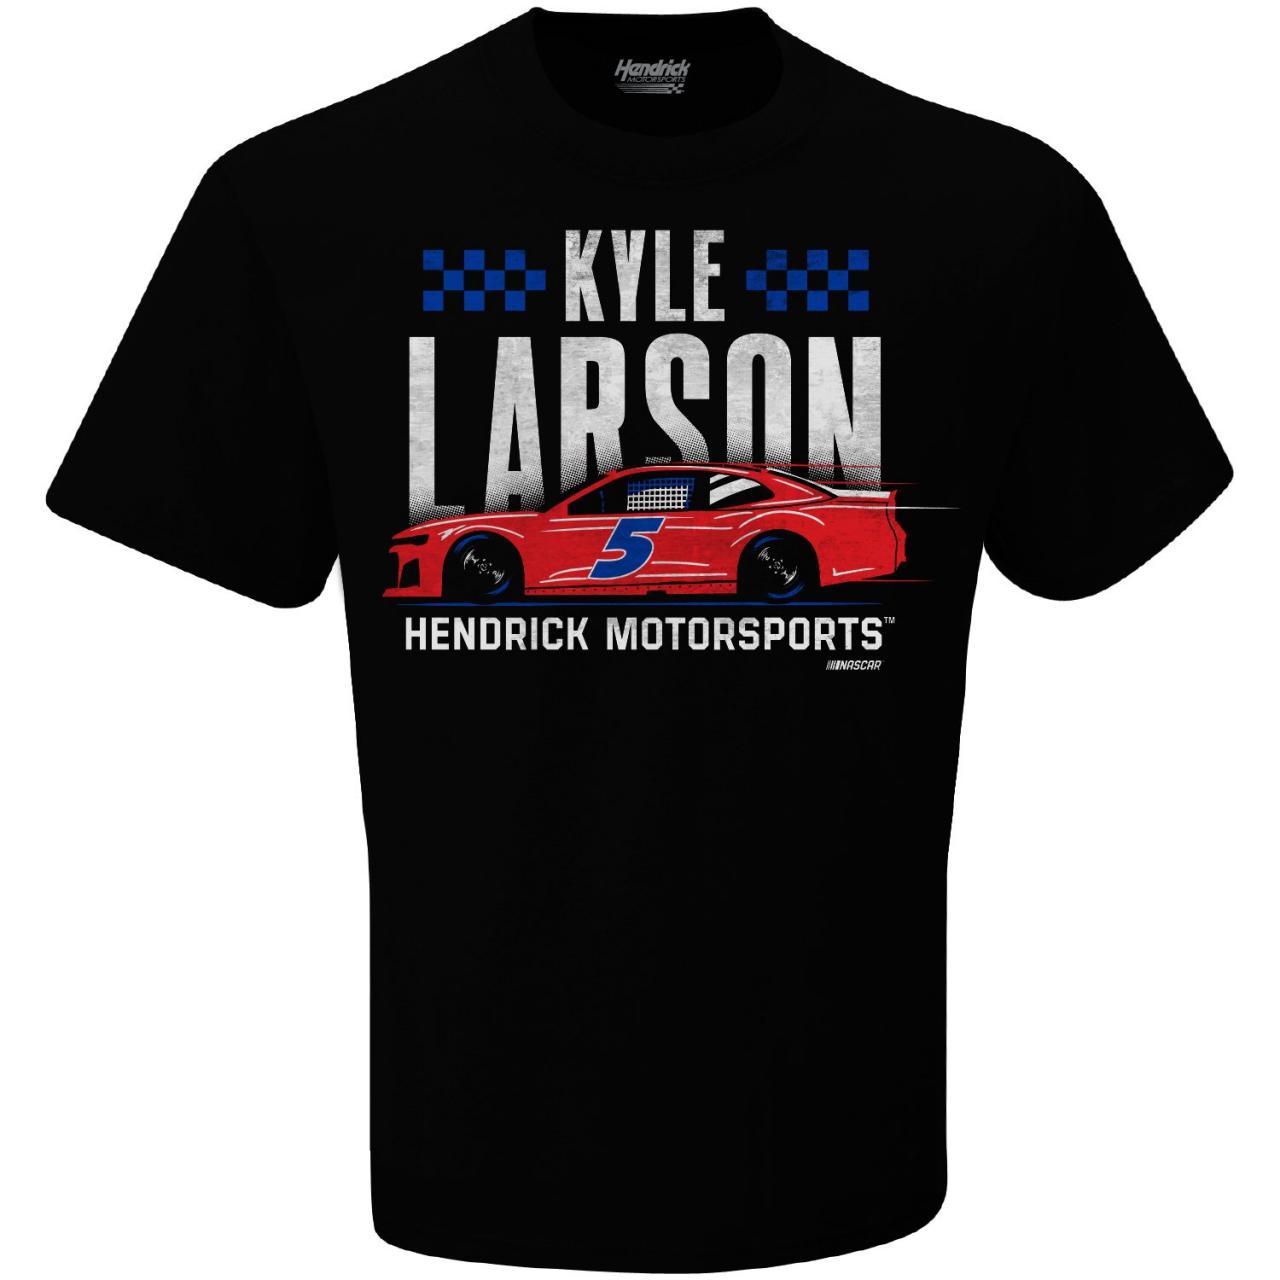 Kyle Larson - Hendrick Motorsports shirt